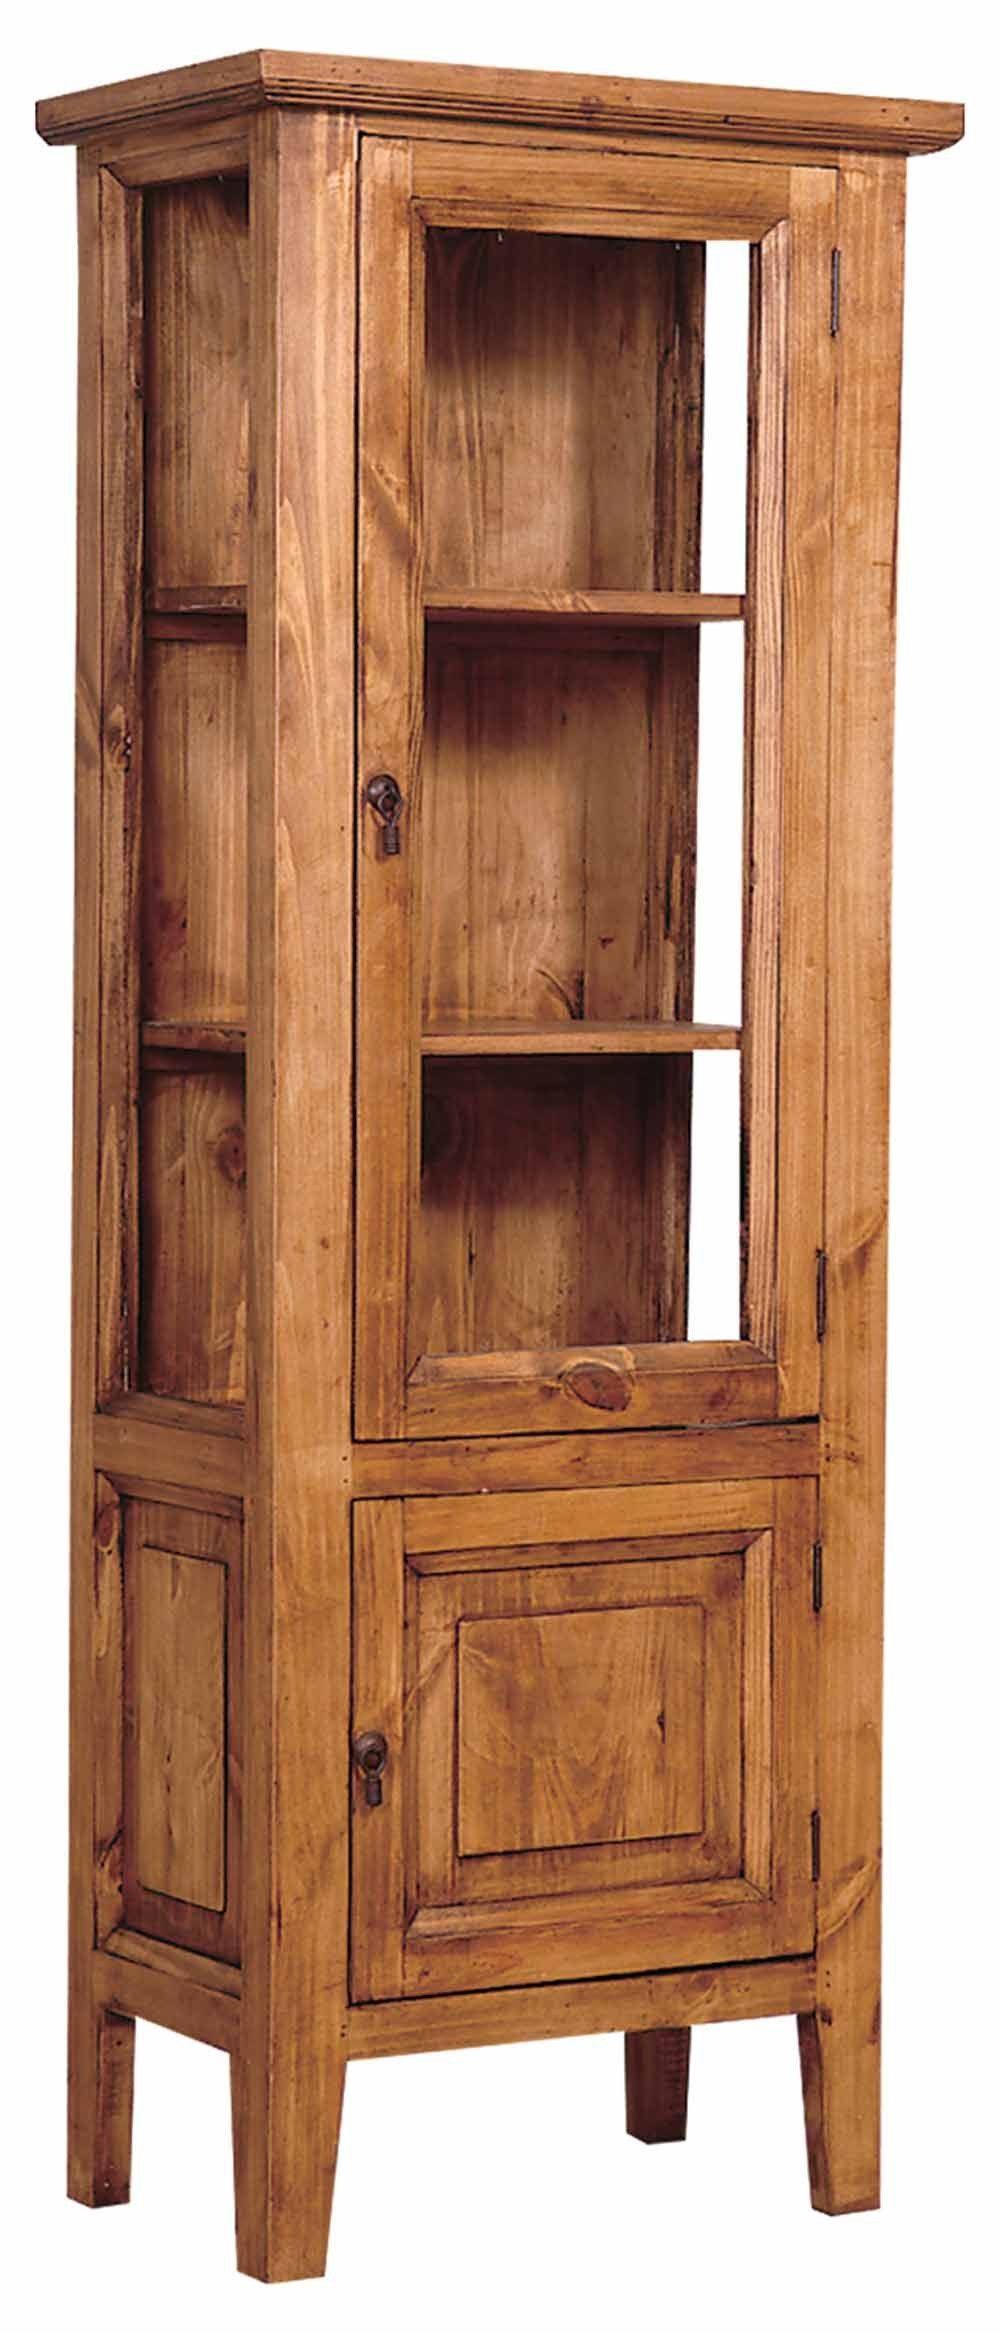 Rustic Pine Curio Cabinet Dining Furniture Shabby Chic Furniture Shabby Chic Kitchen Cabinet